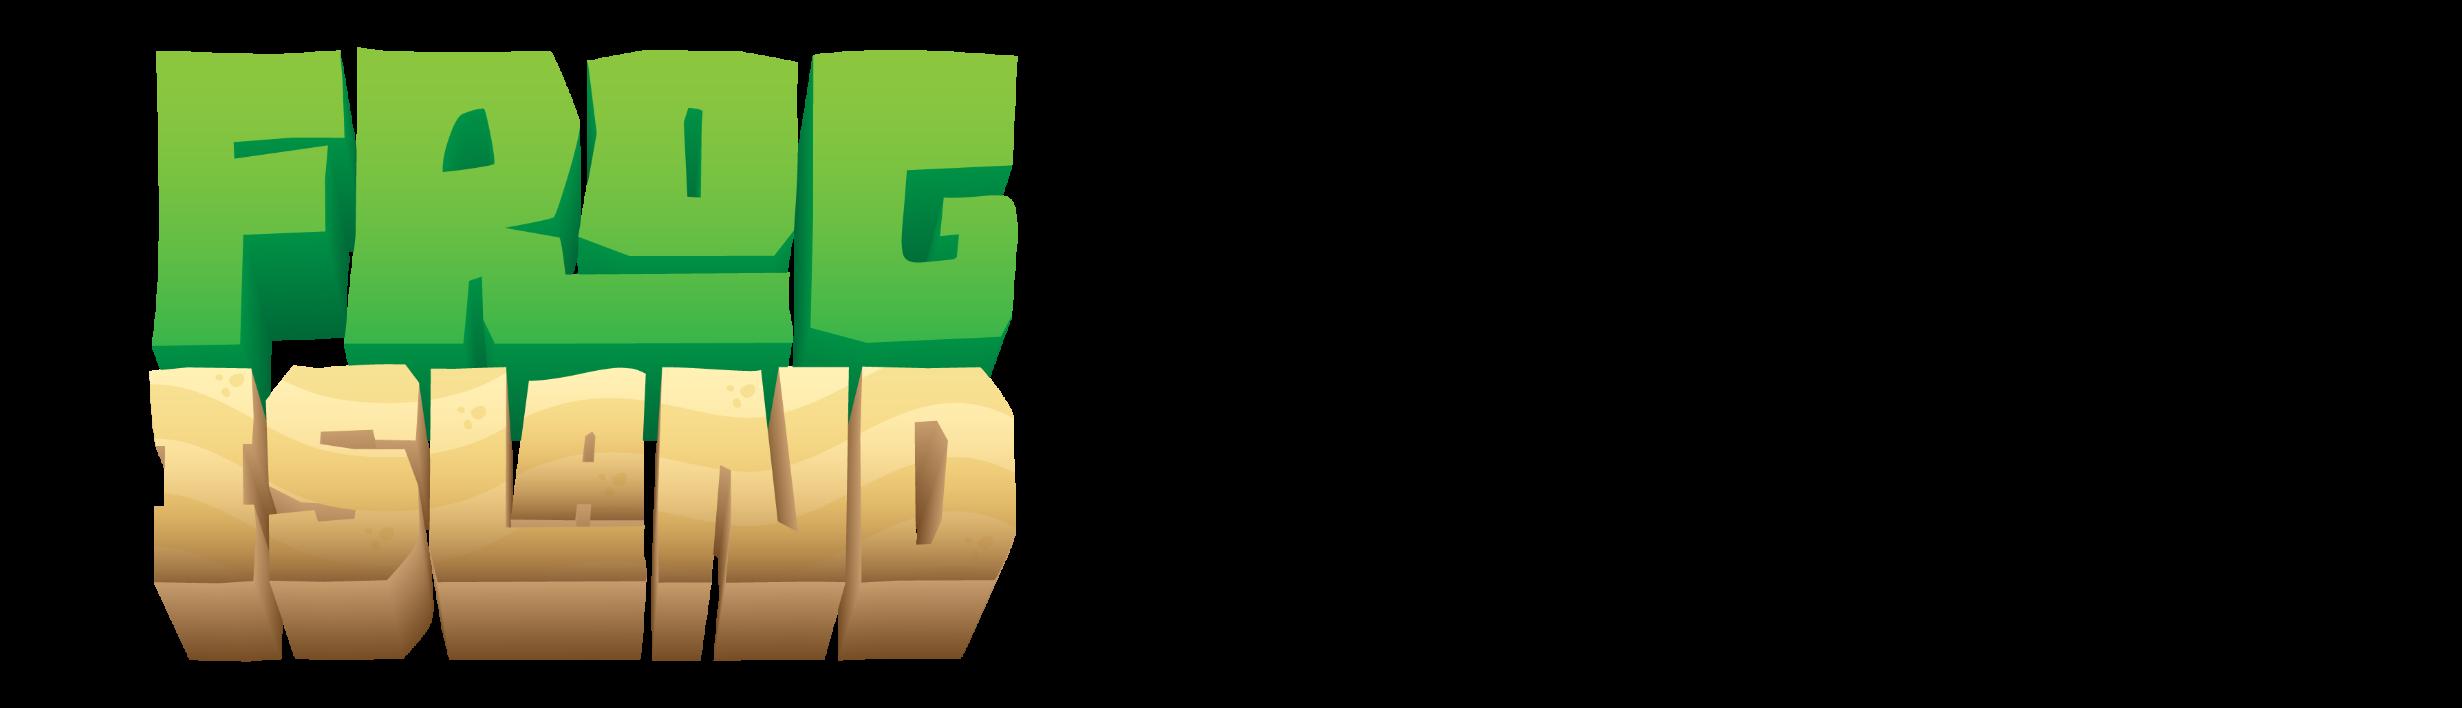 Frog Island (Version 0.4A)